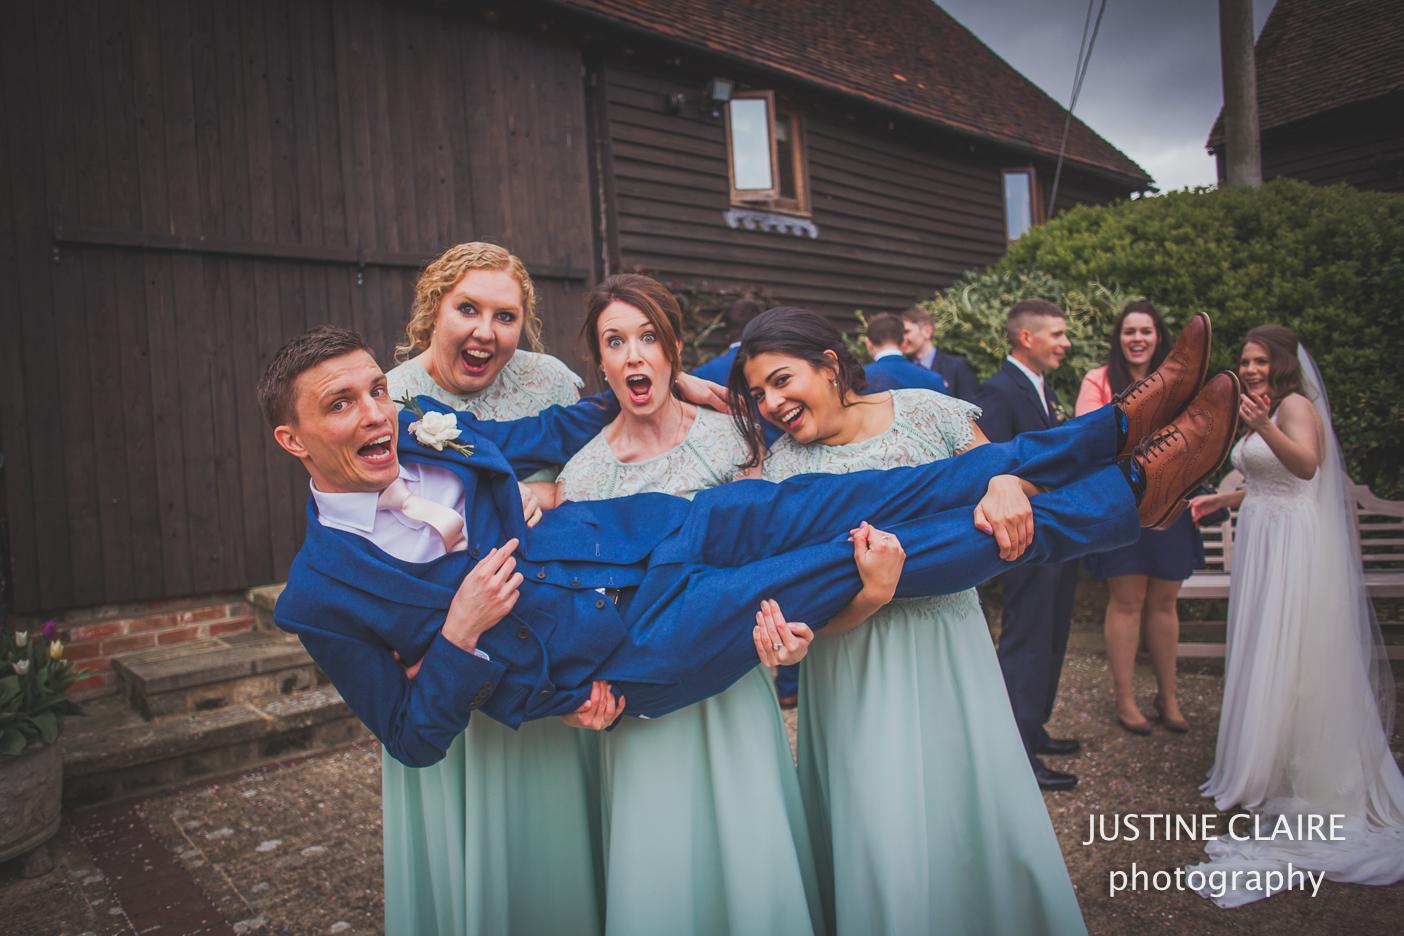 Fitzleroi Fittleworth petworth Billingshurst farm Wedding Photography by Justine Claire photographer Arundel Worthing Brighton-35.jpg